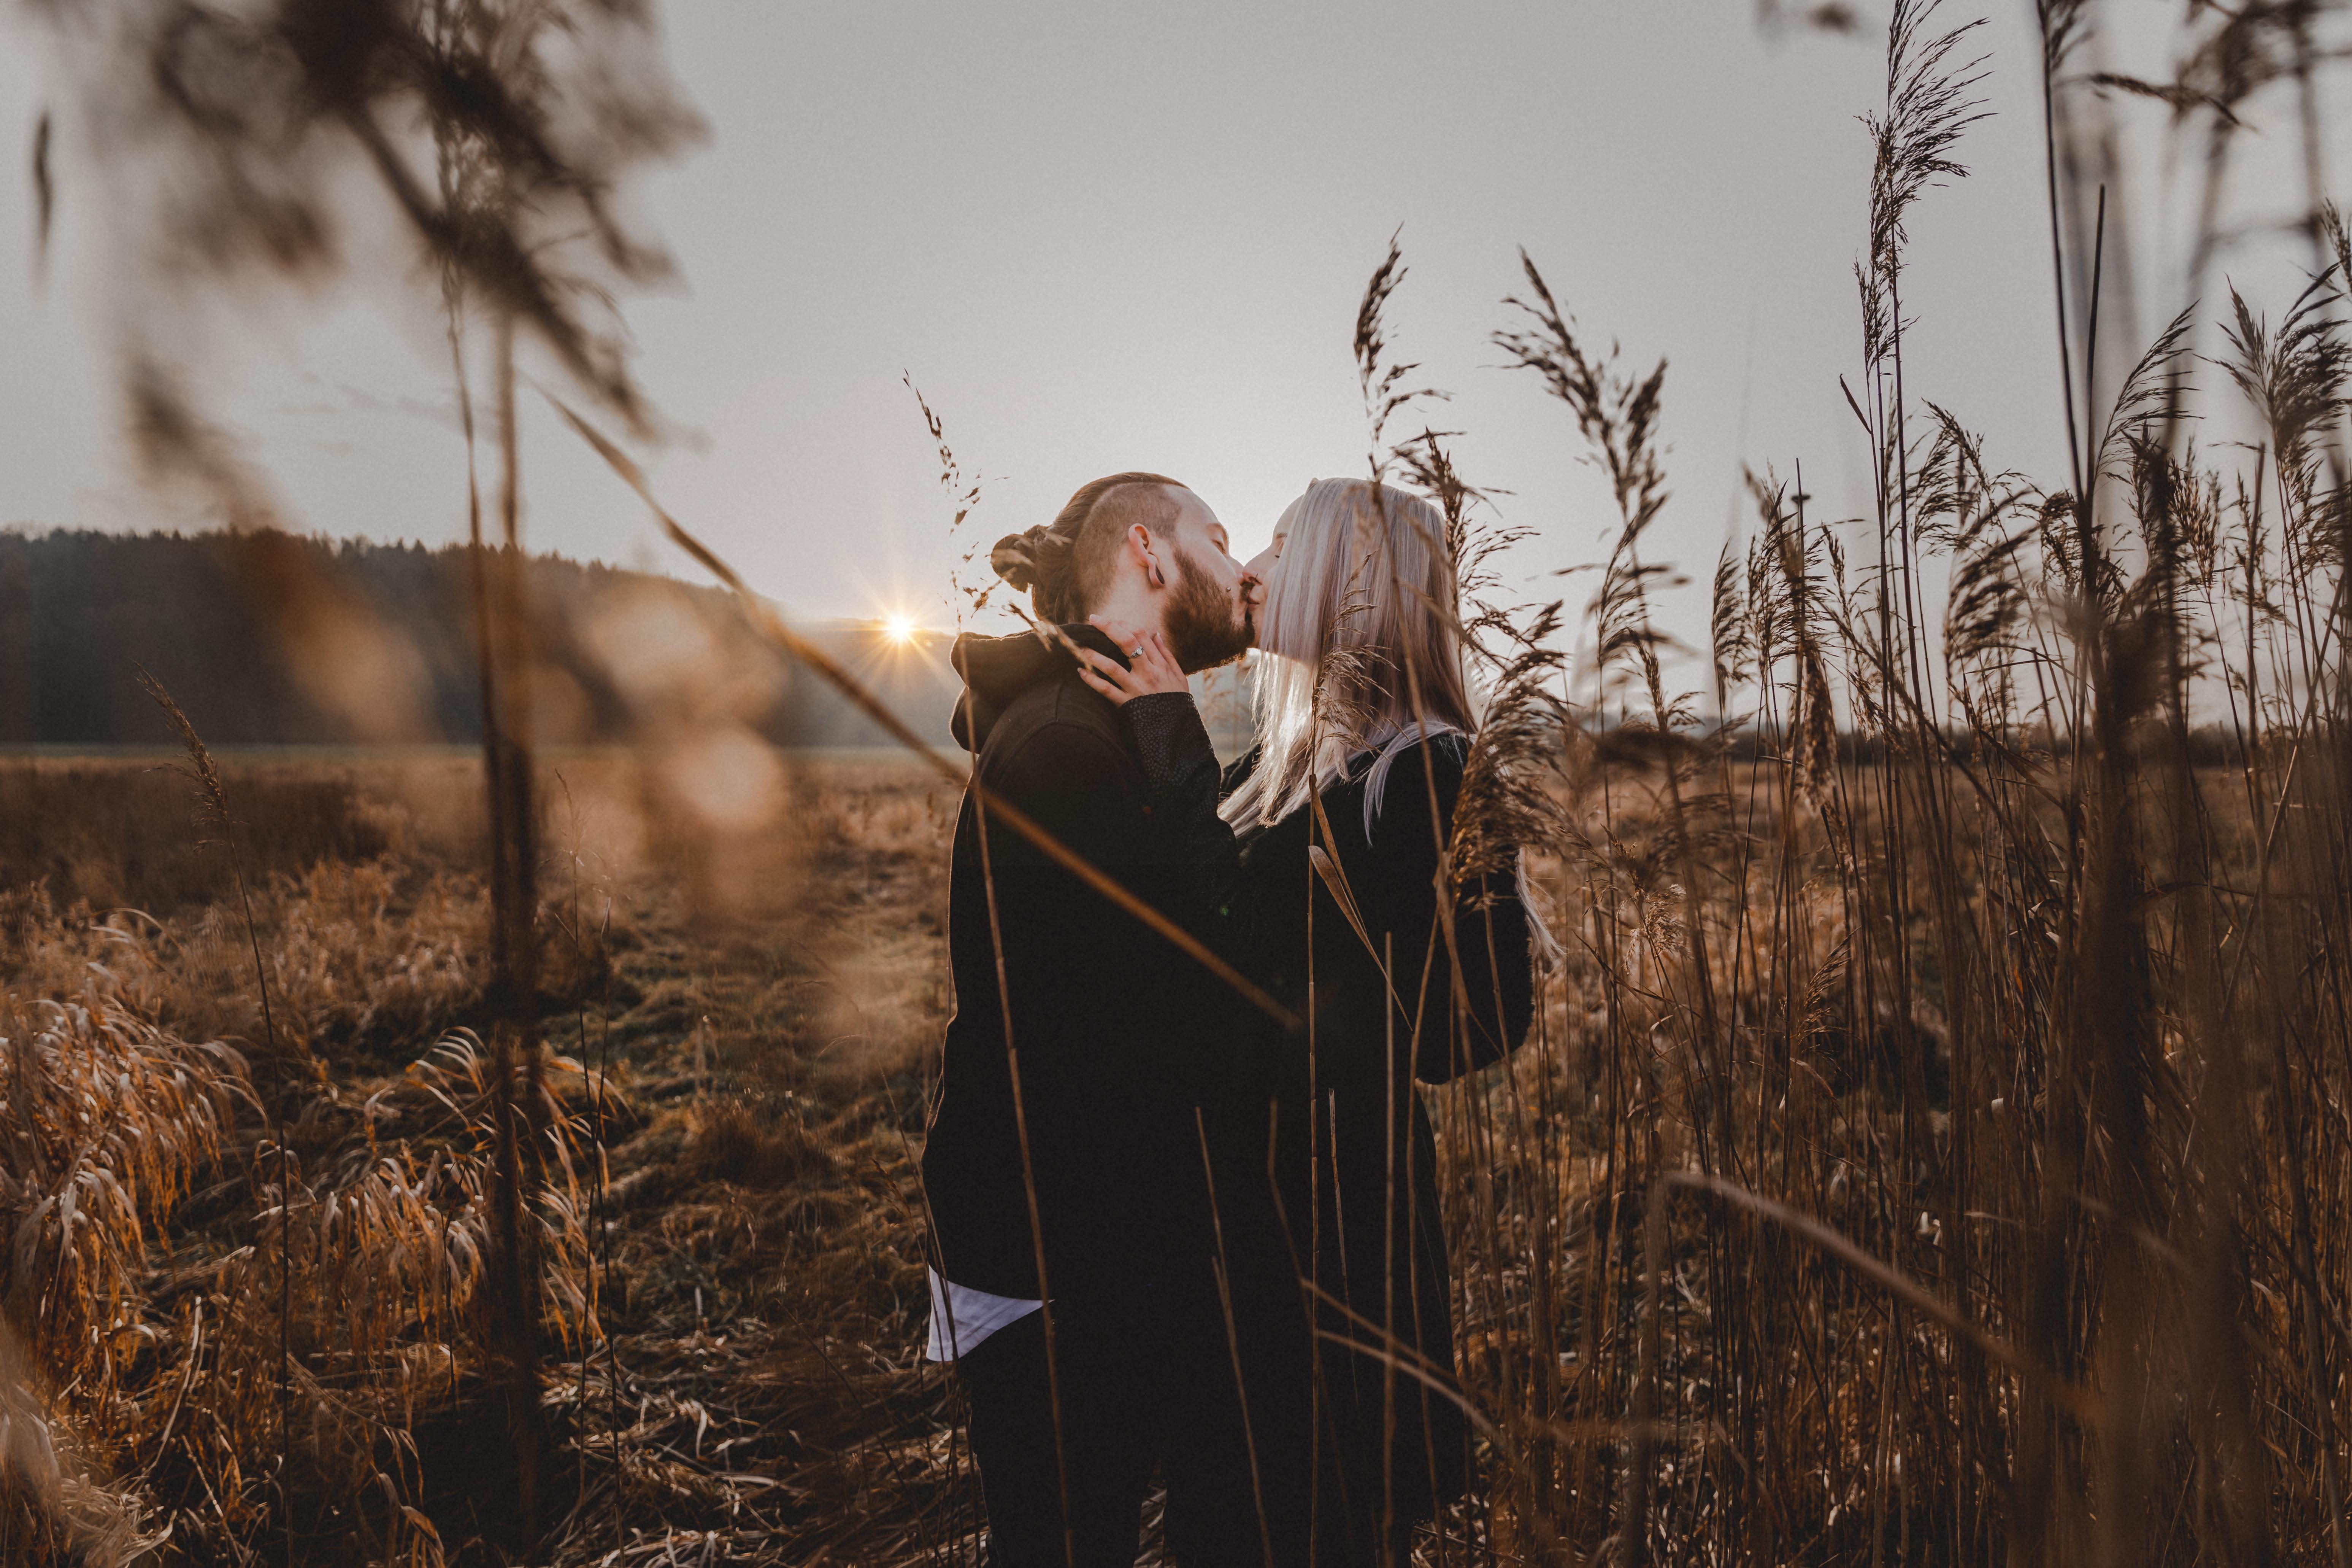 Paarfotograf_URBANERIE_Daniela_Goth_Nürn